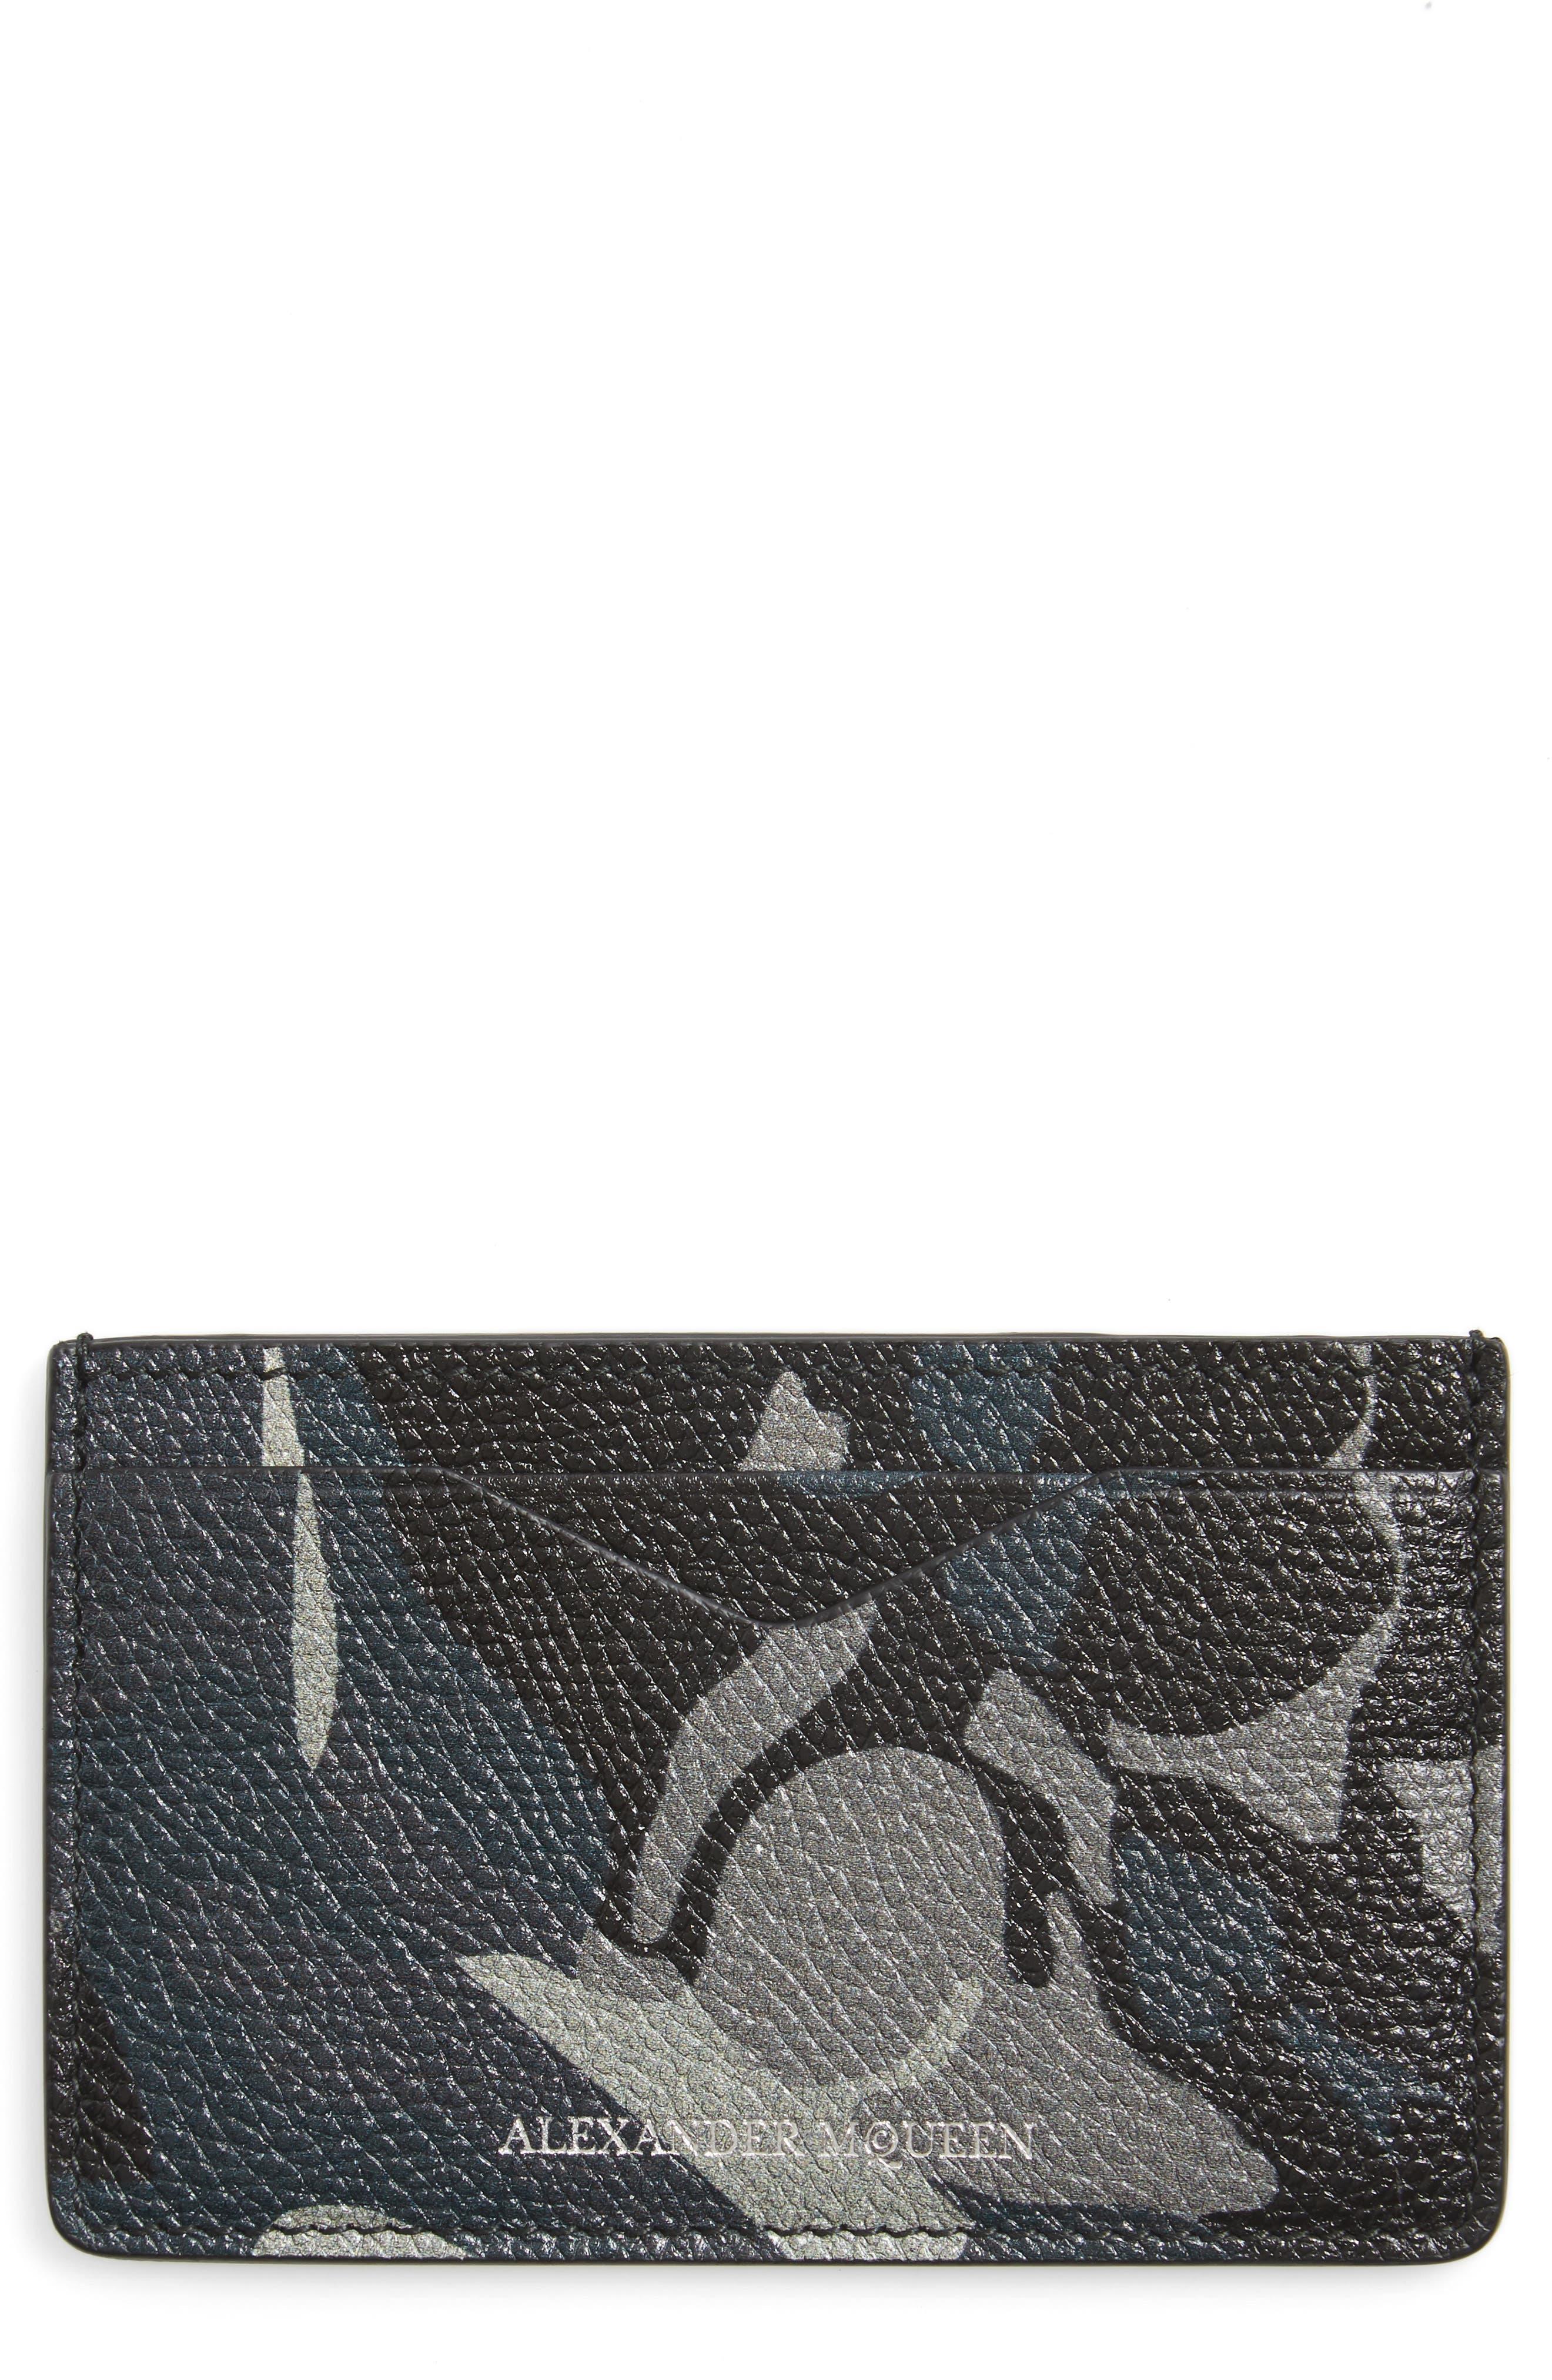 Camo Leather Card Case,                             Main thumbnail 1, color,                             001